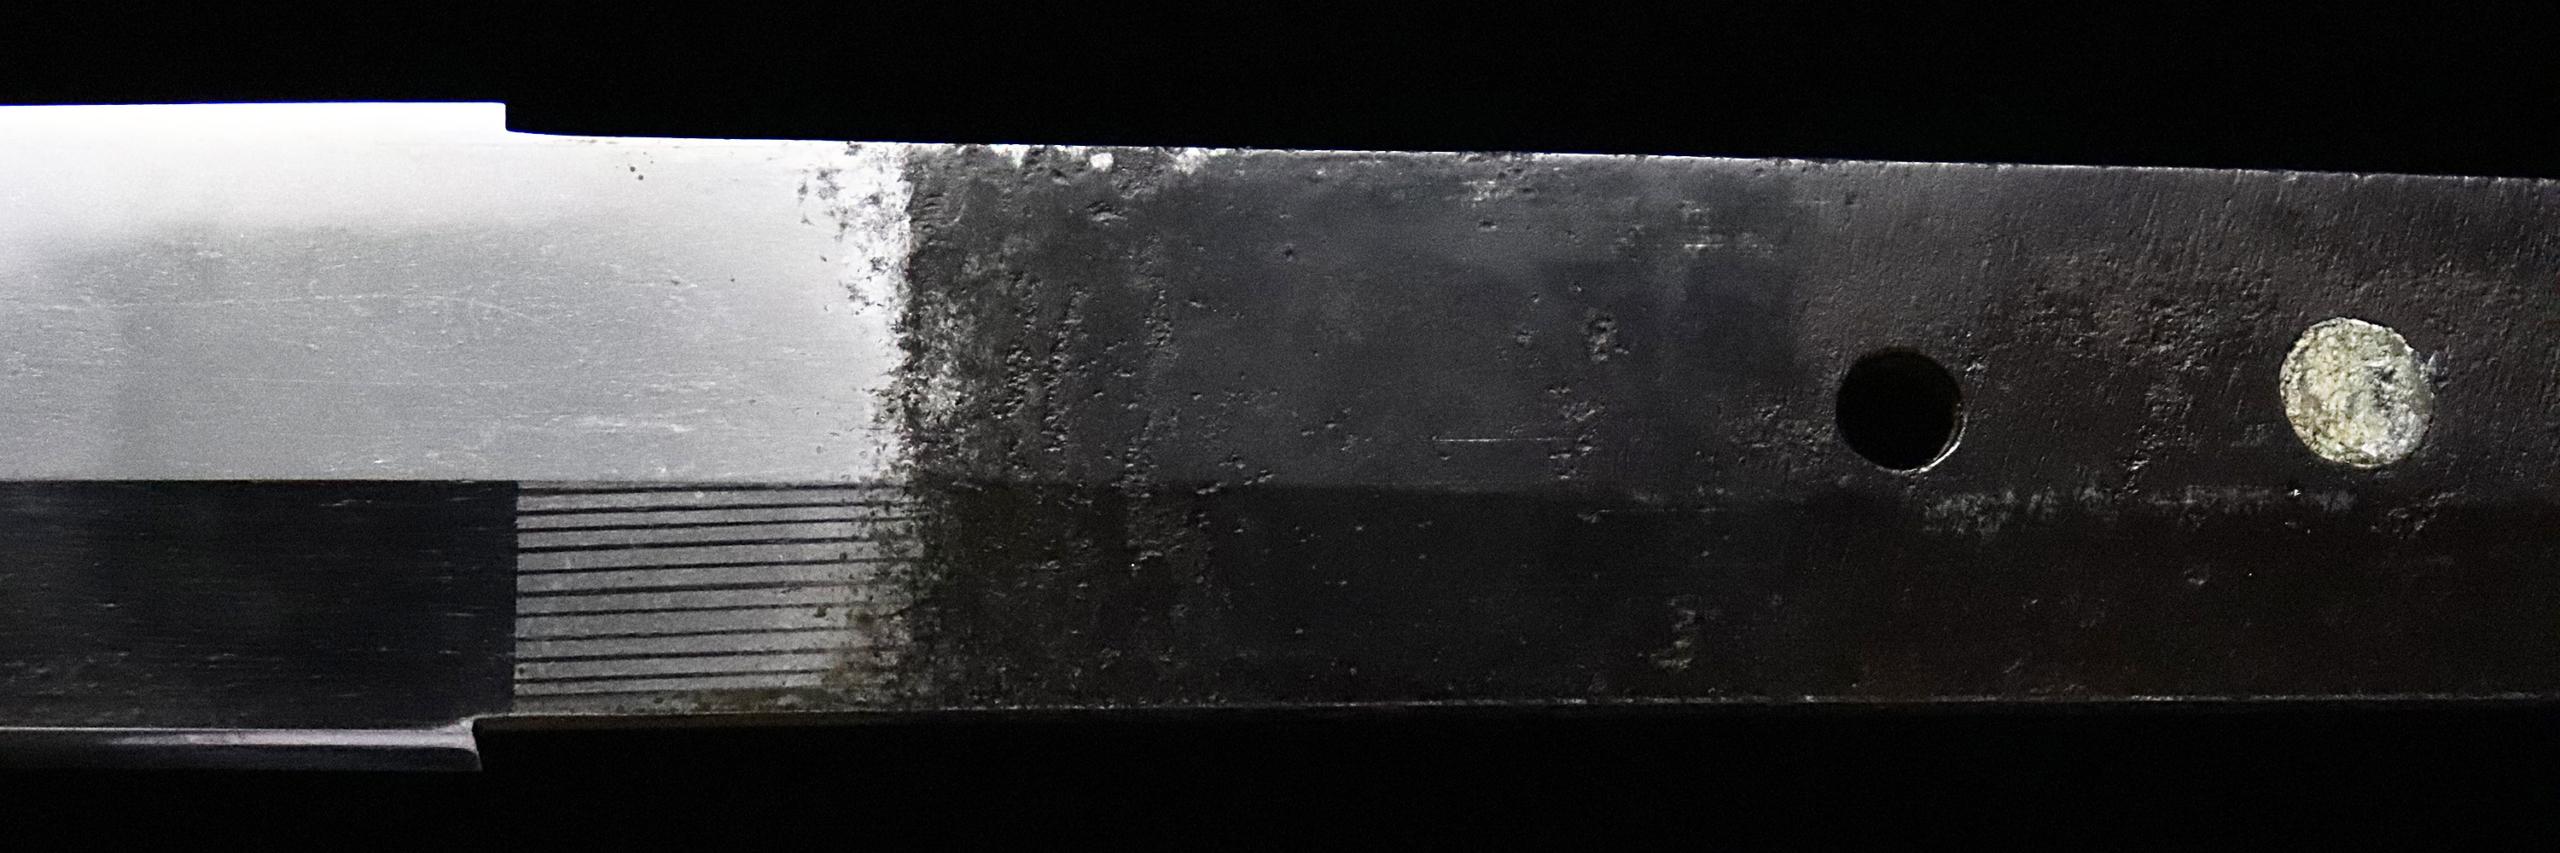 01-3003